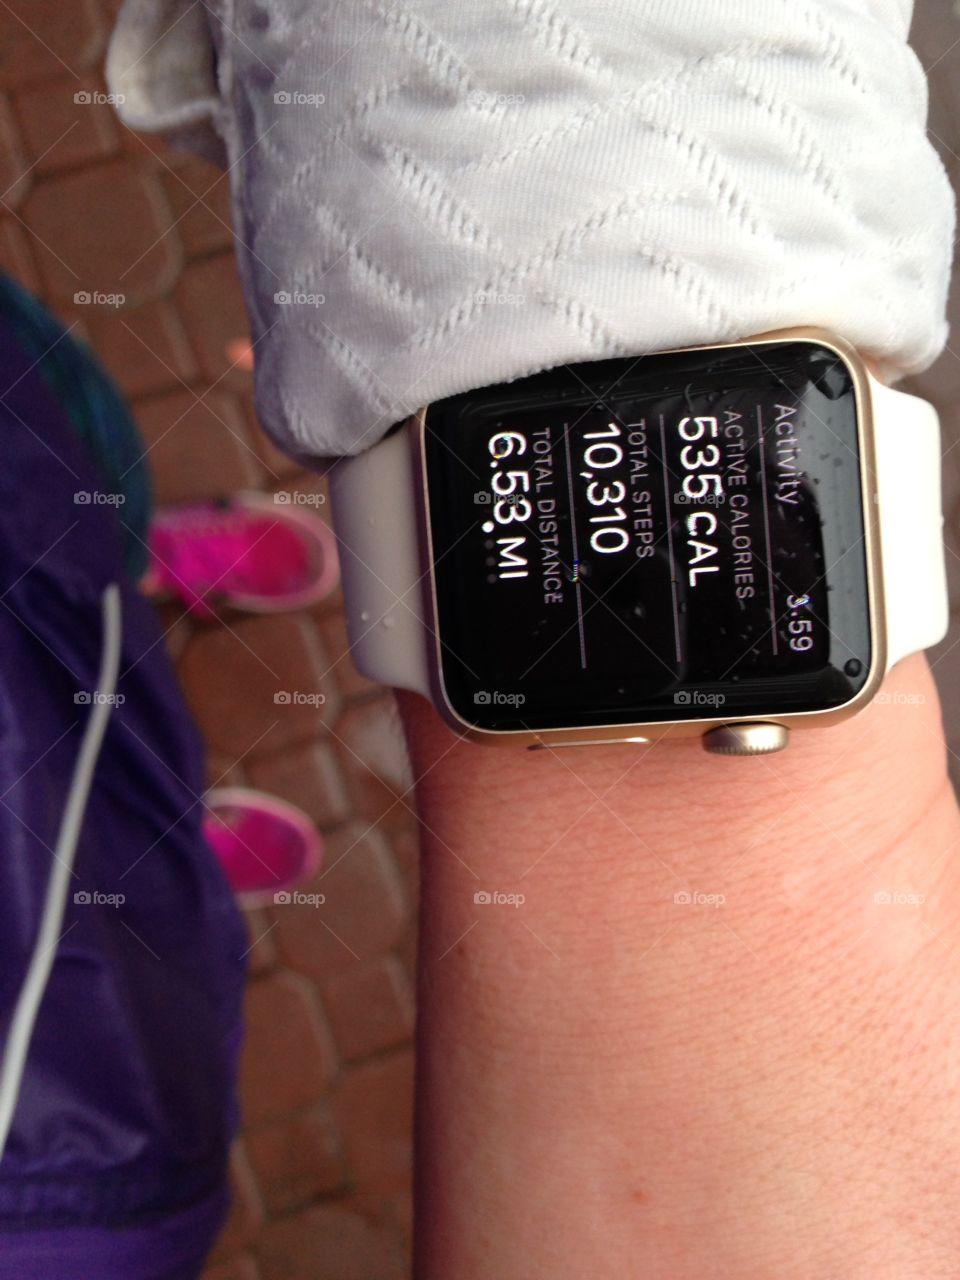 Apple Watch post-run stats